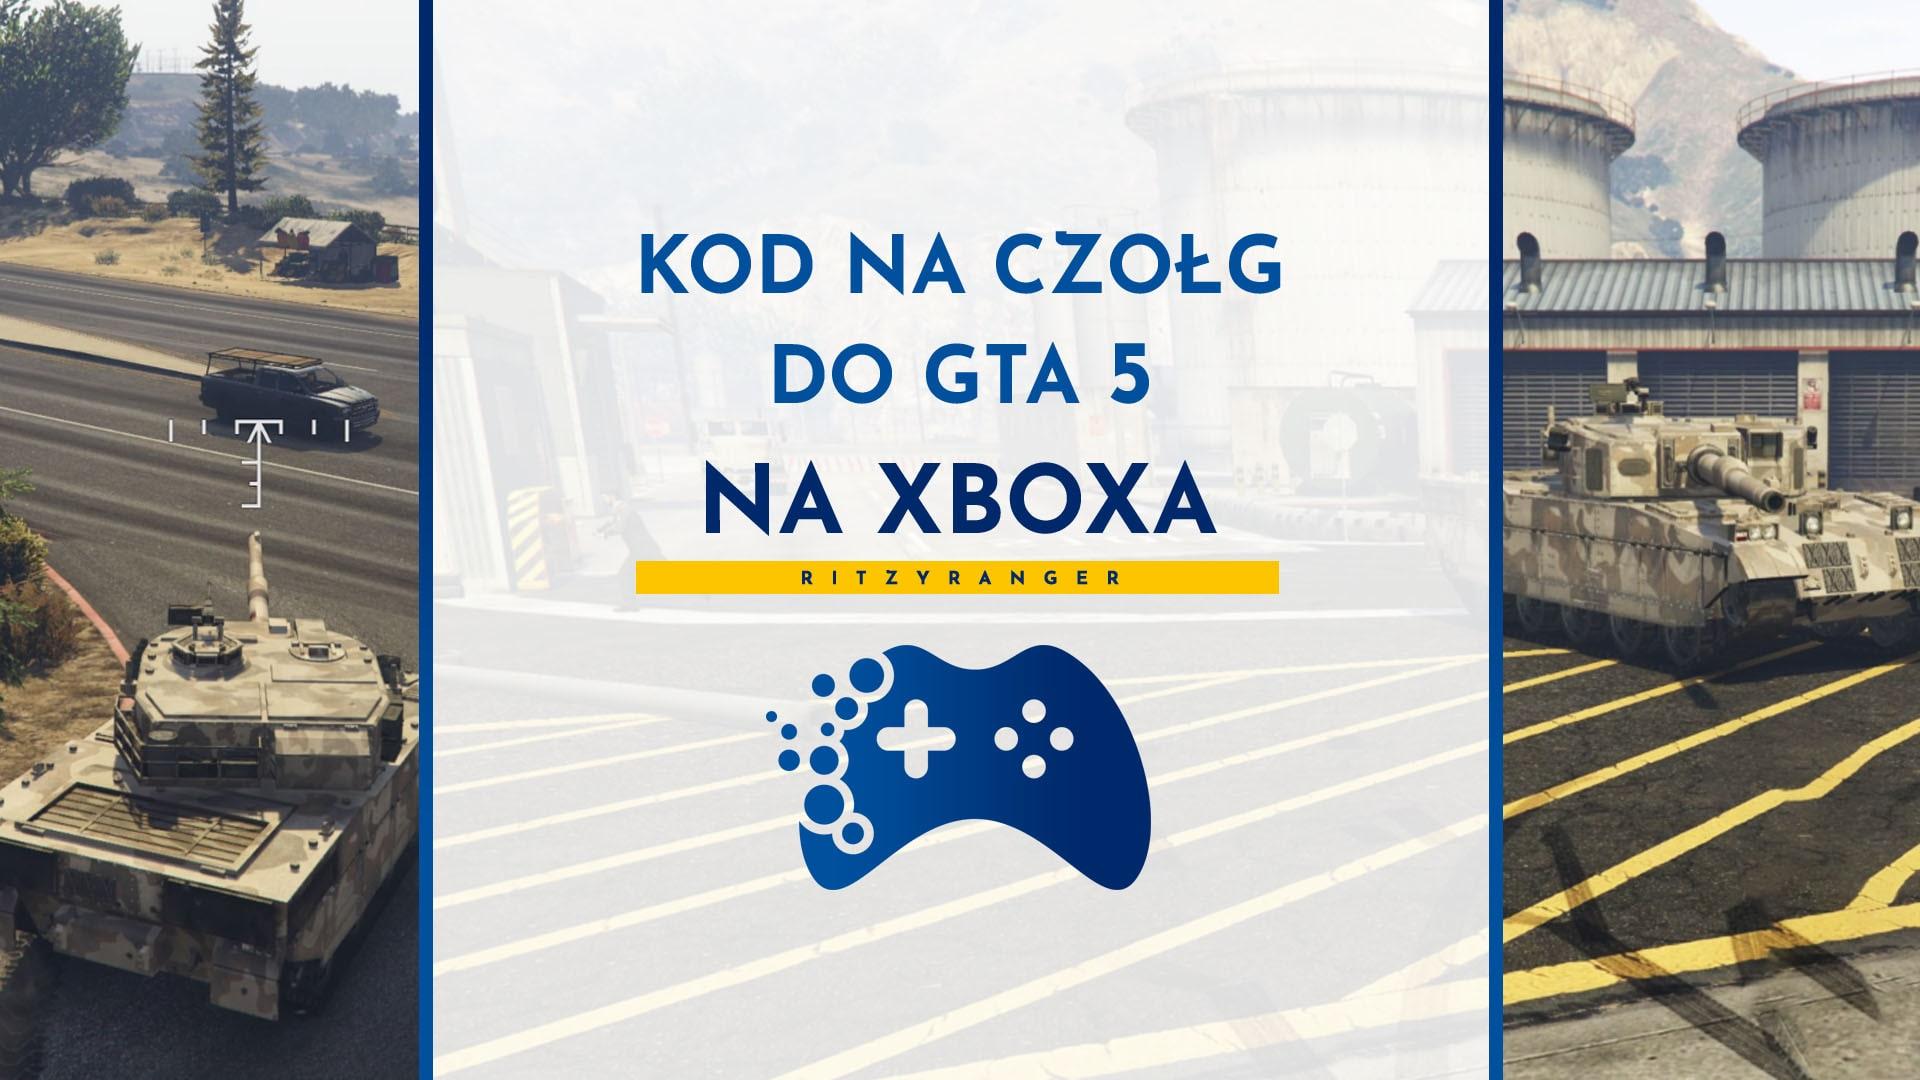 Kod na czołg do GTA 5 na PS